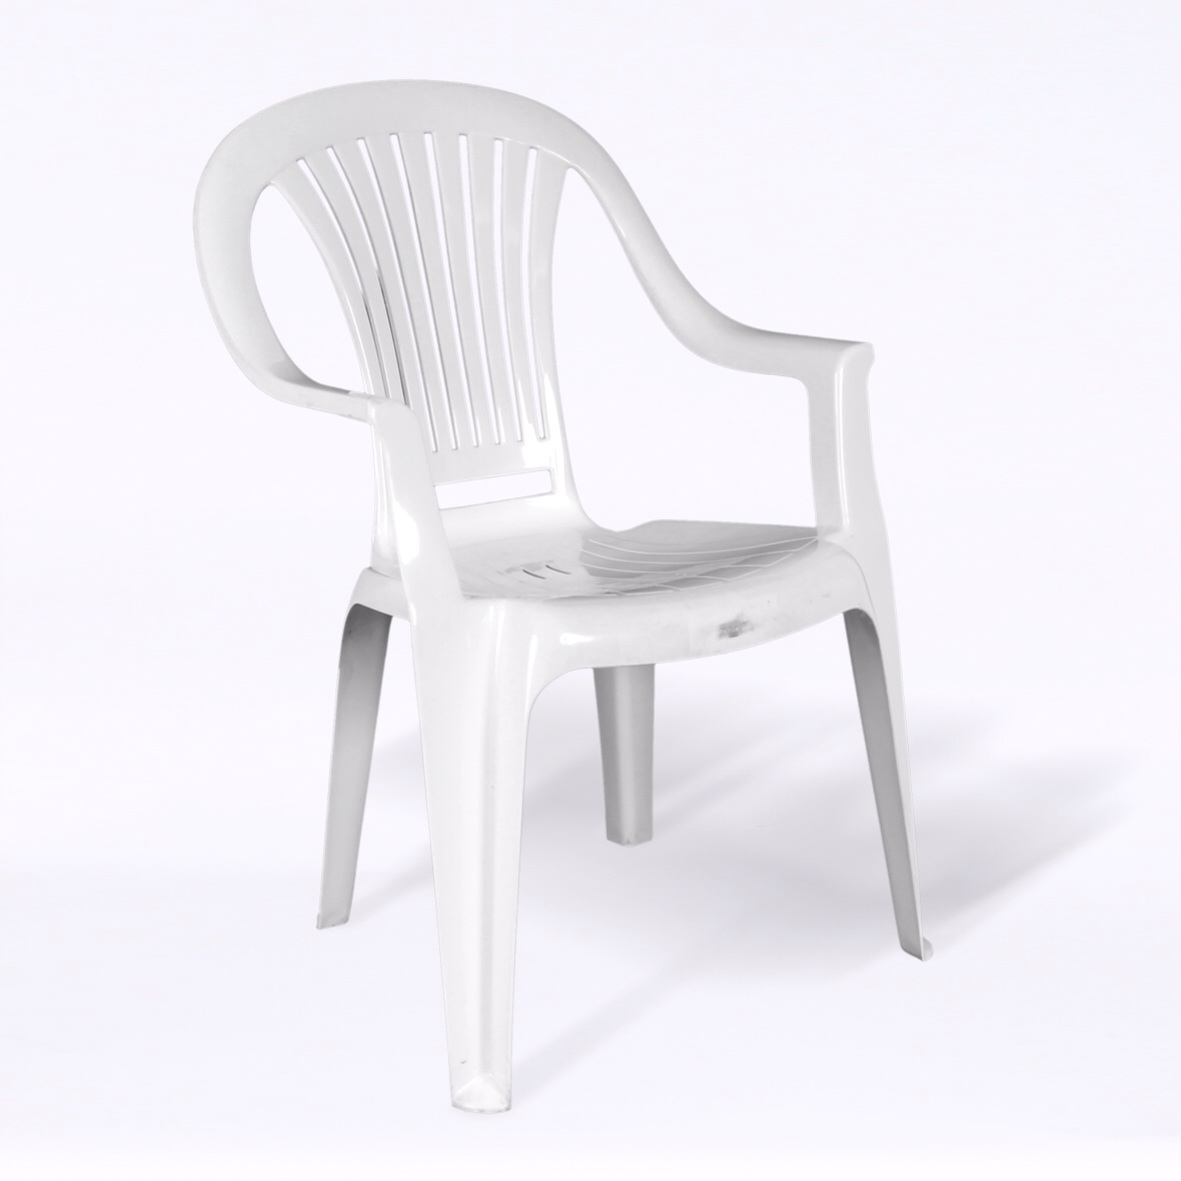 plastic garden chairs  73